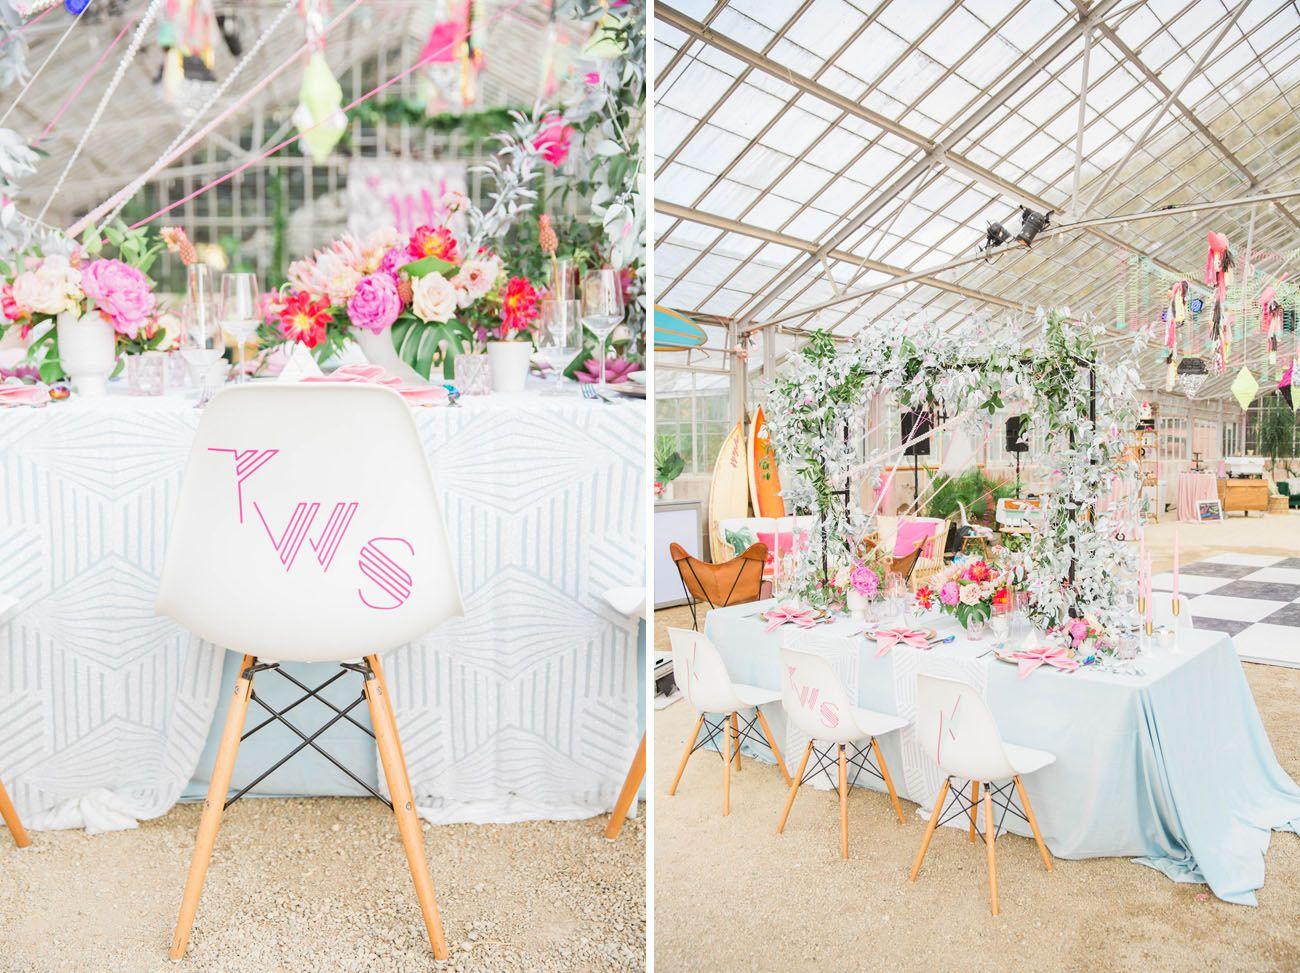 Magnificent 80s Wedding Theme Embellishment The Wedding Ideas